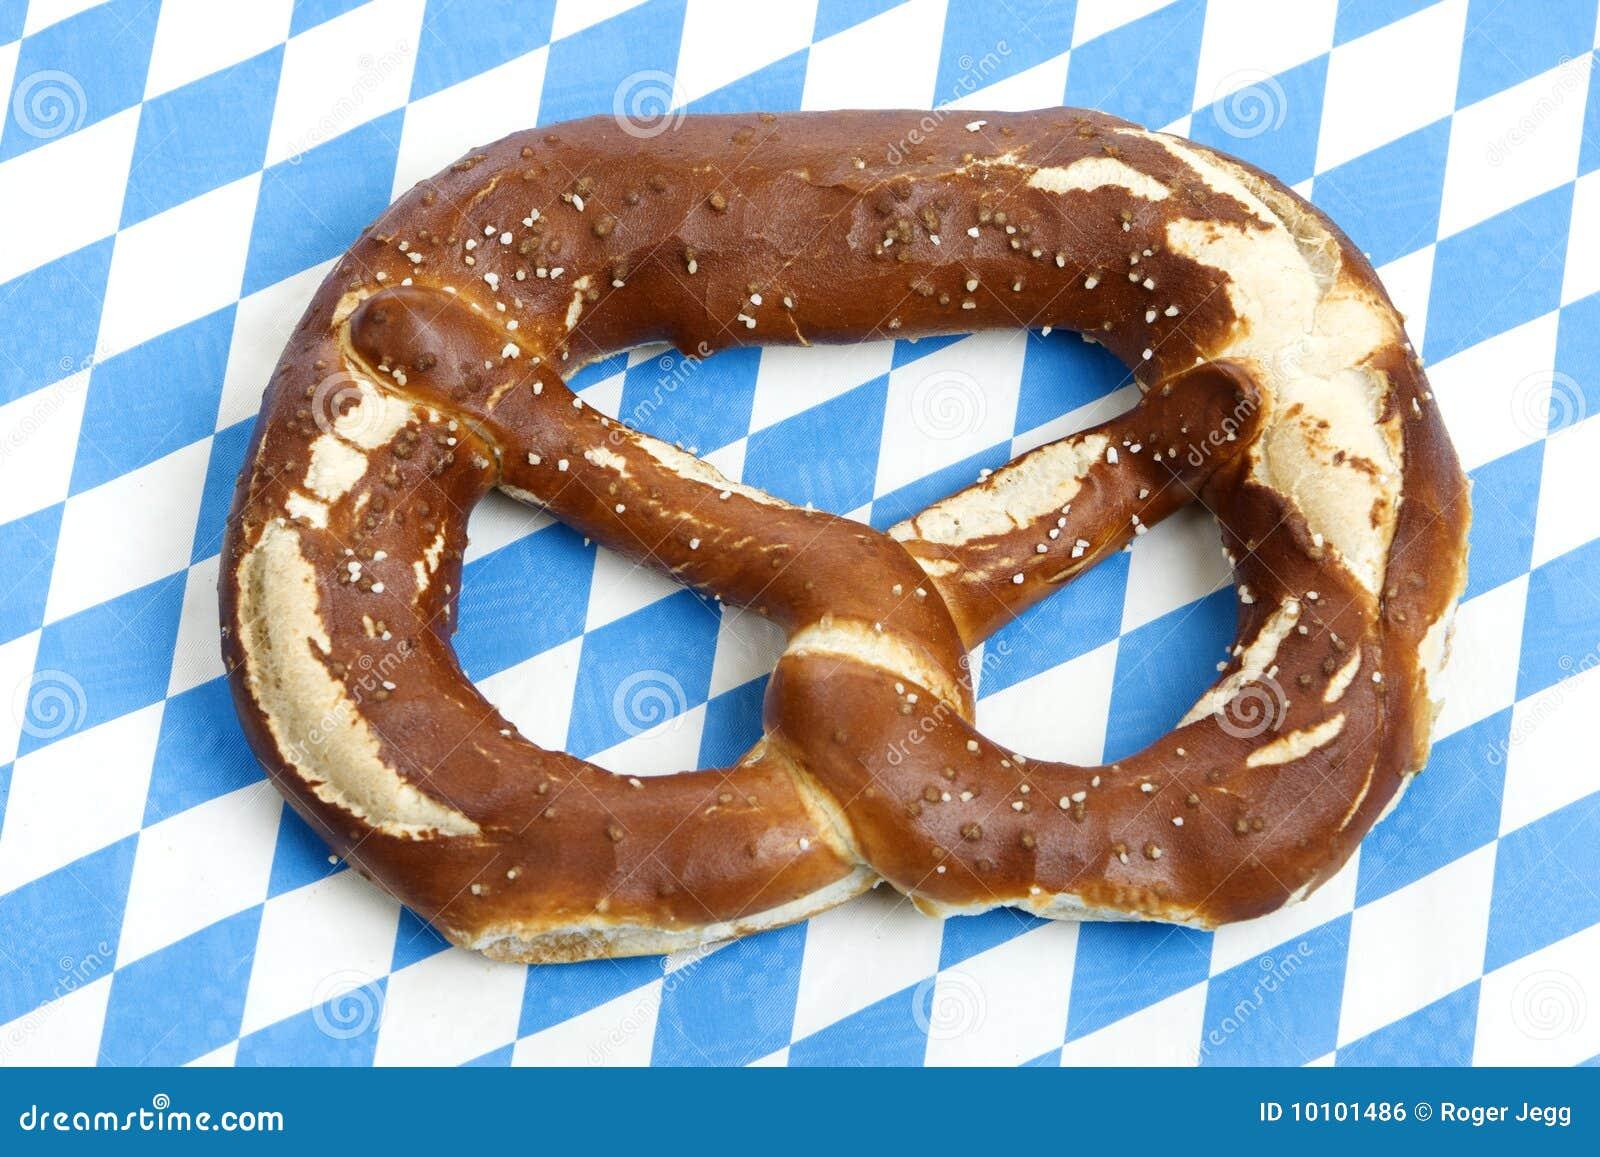 Oktoberfest Pretzel Royalty Free Stock Image - Image: 10101486